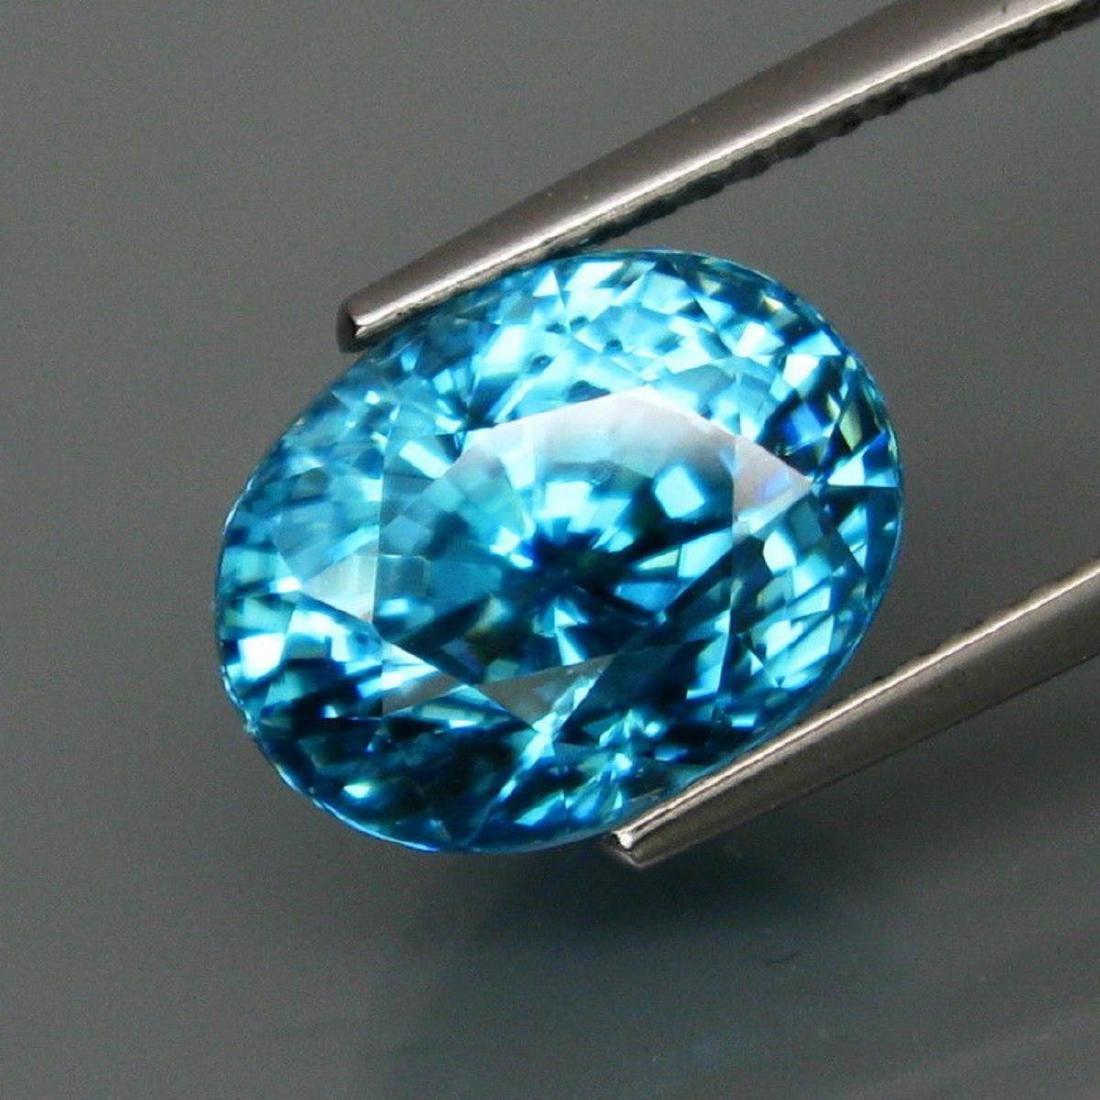 Natural BIG Blue Cambodian Zircon 9.68 Ct